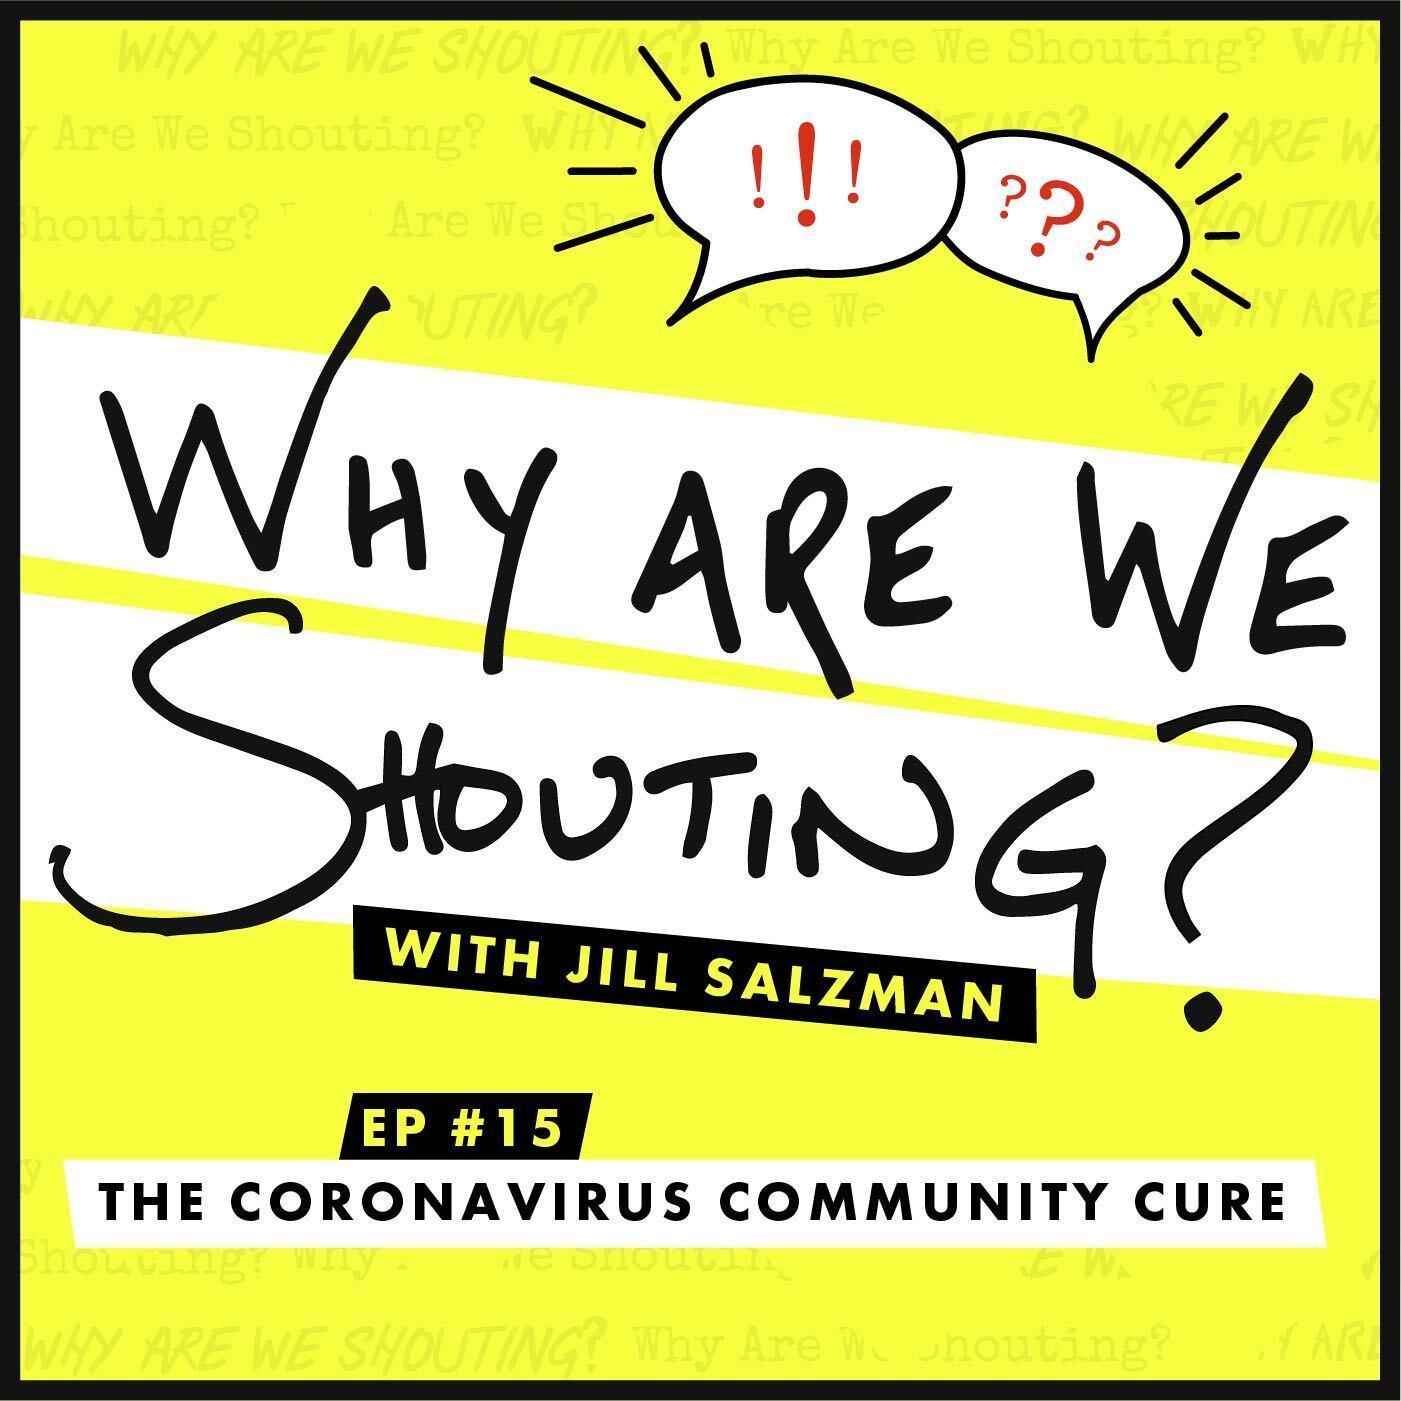 The Coronavirus Community Cure